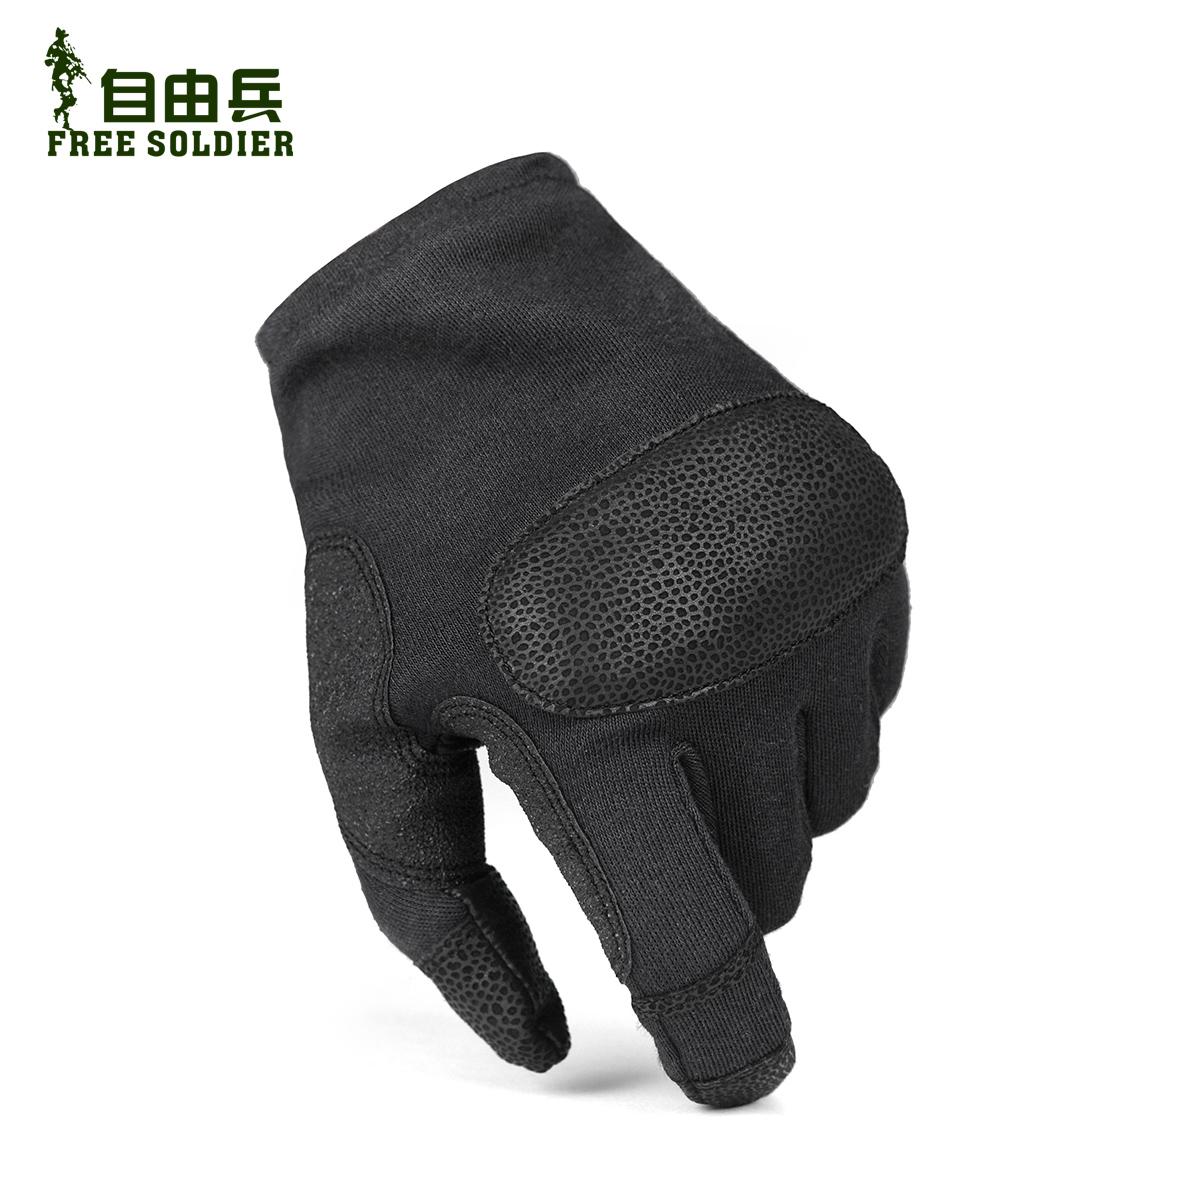 Перчатки для туризма Free Soldier ah0001